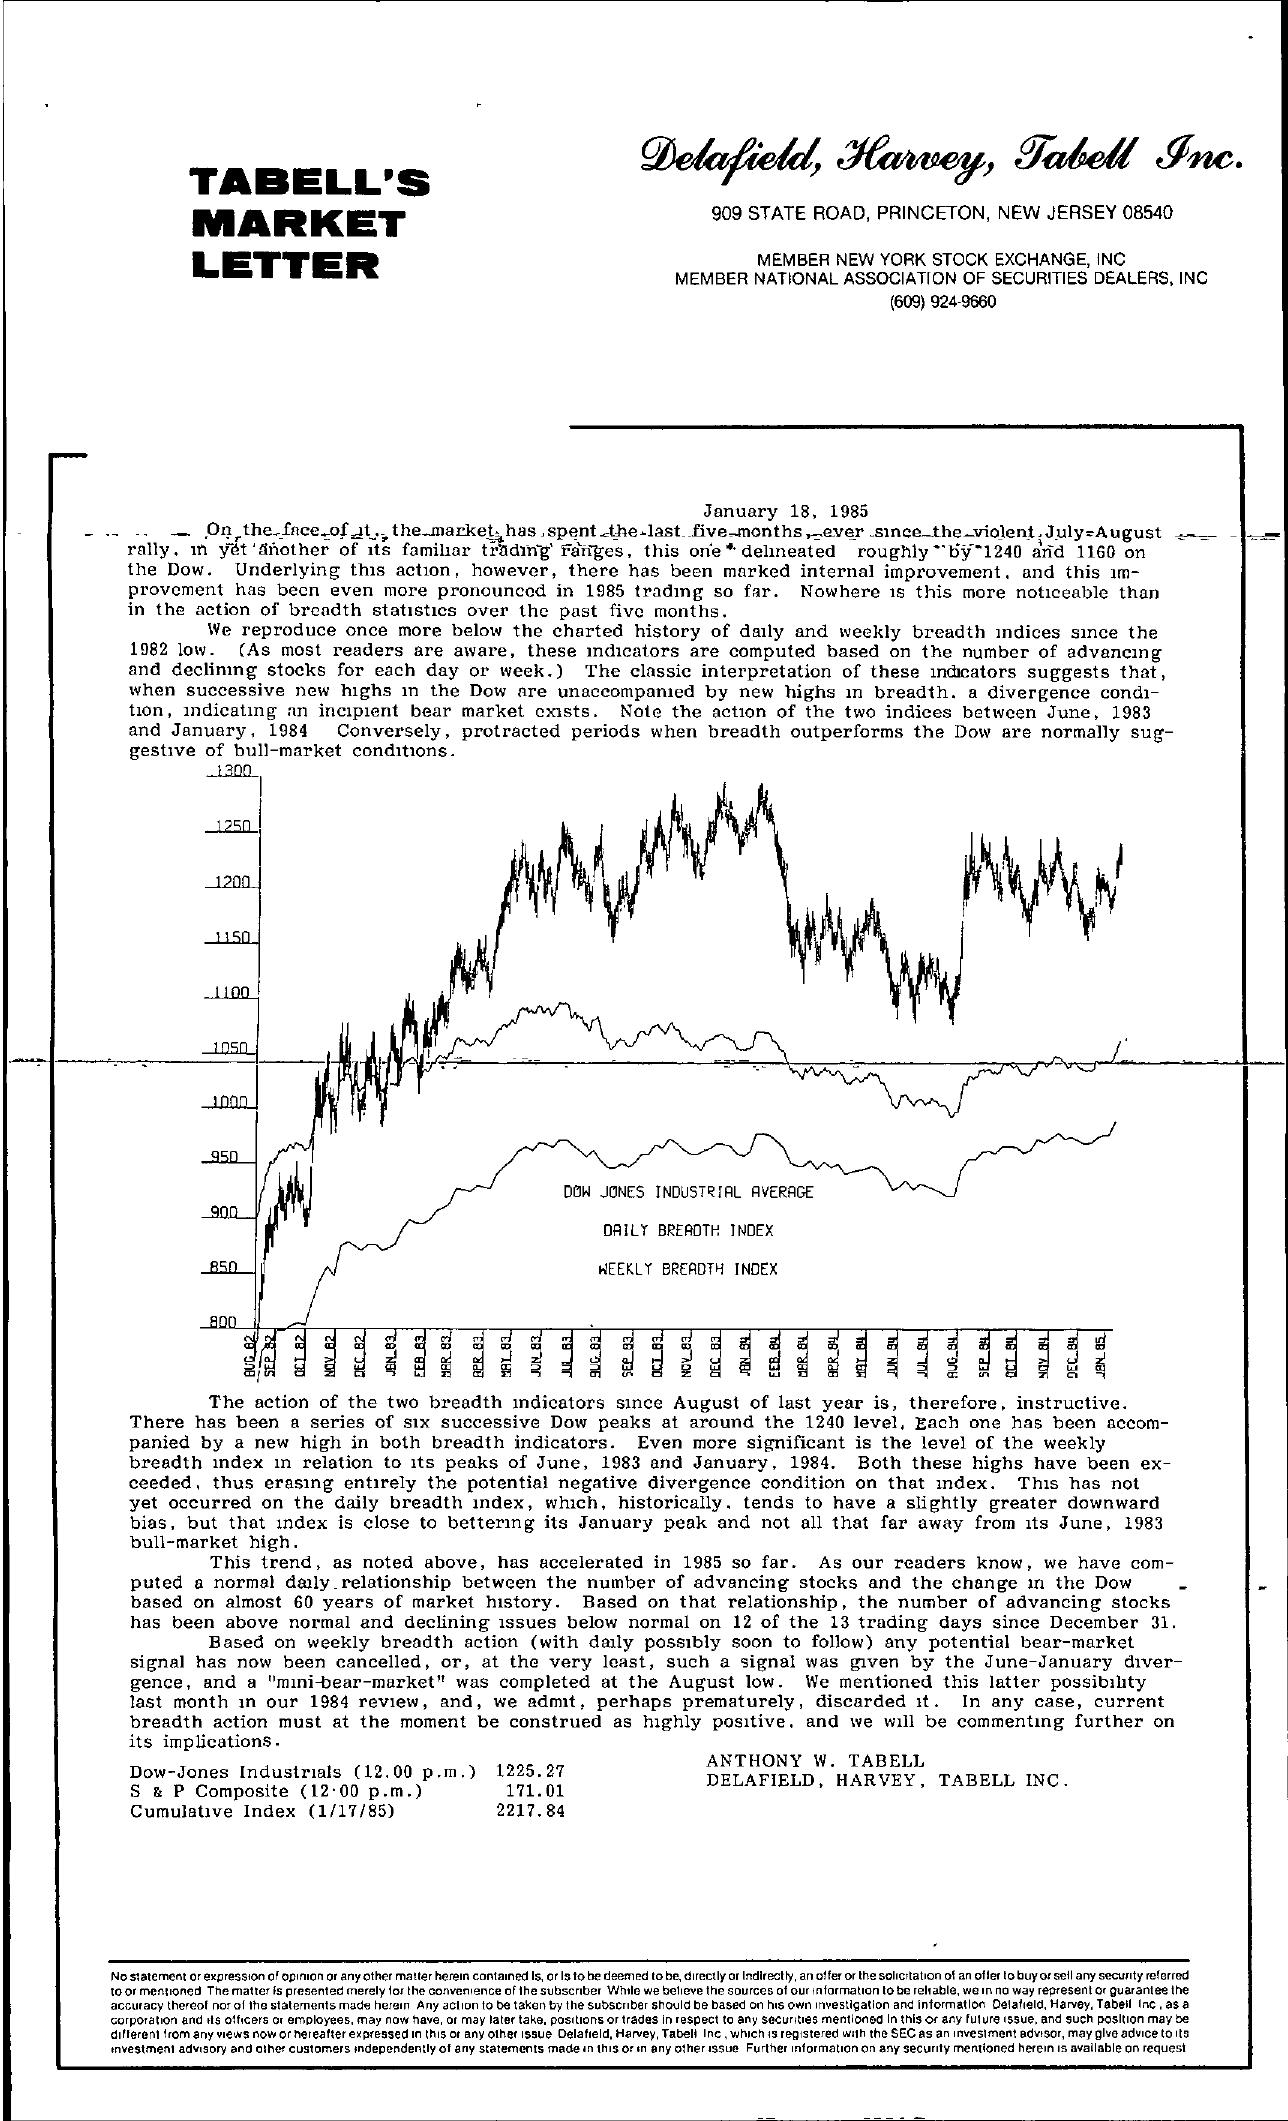 Tabell's Market Letter - January 18, 1985